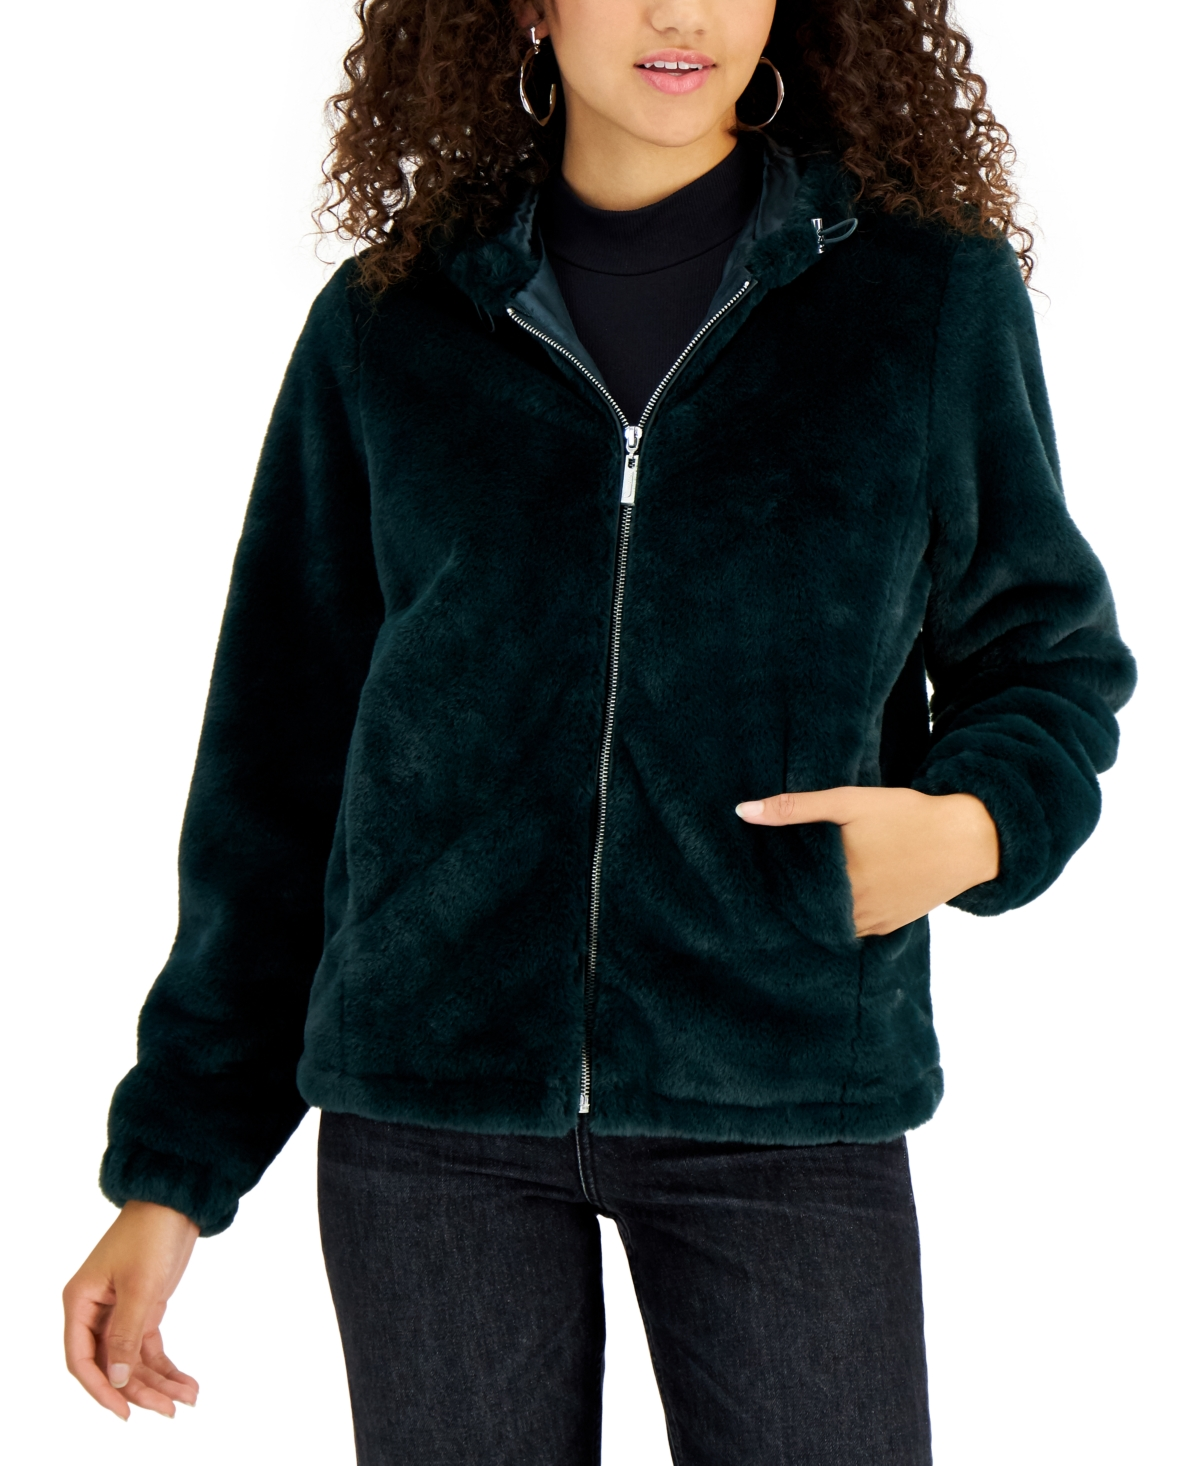 Juniors' Hooded Faux-Fur Coat